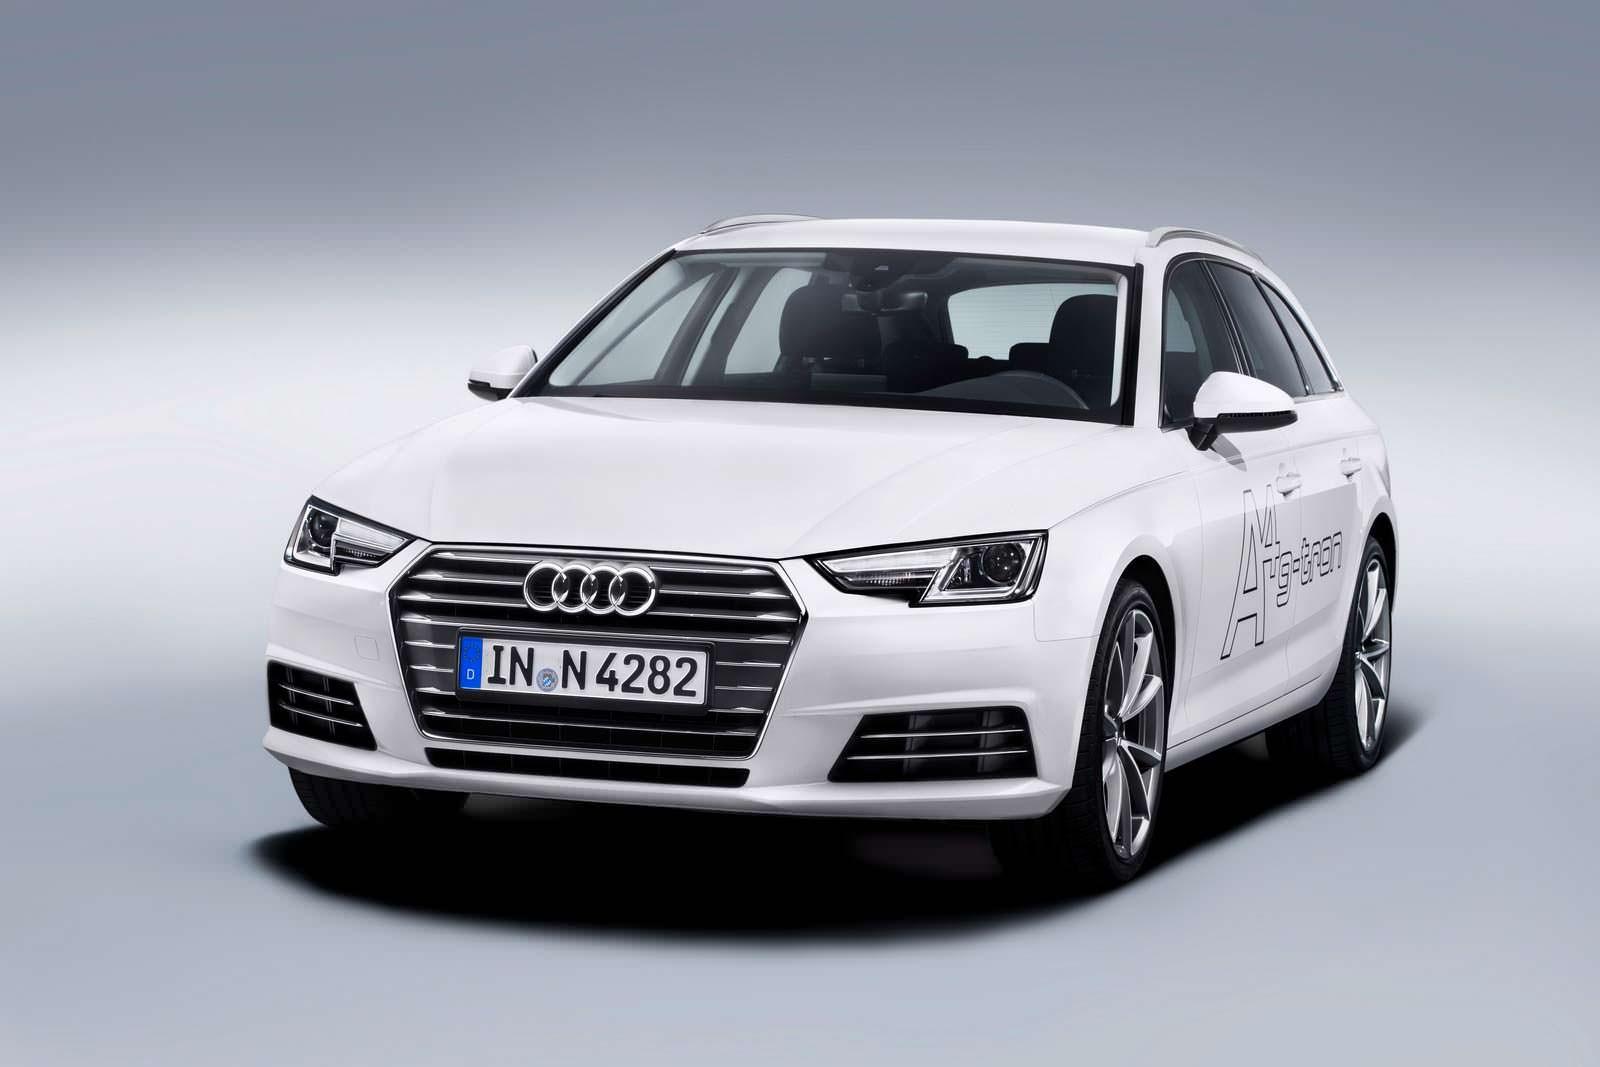 Универсал Audi A4 Avant G-Tron 2018